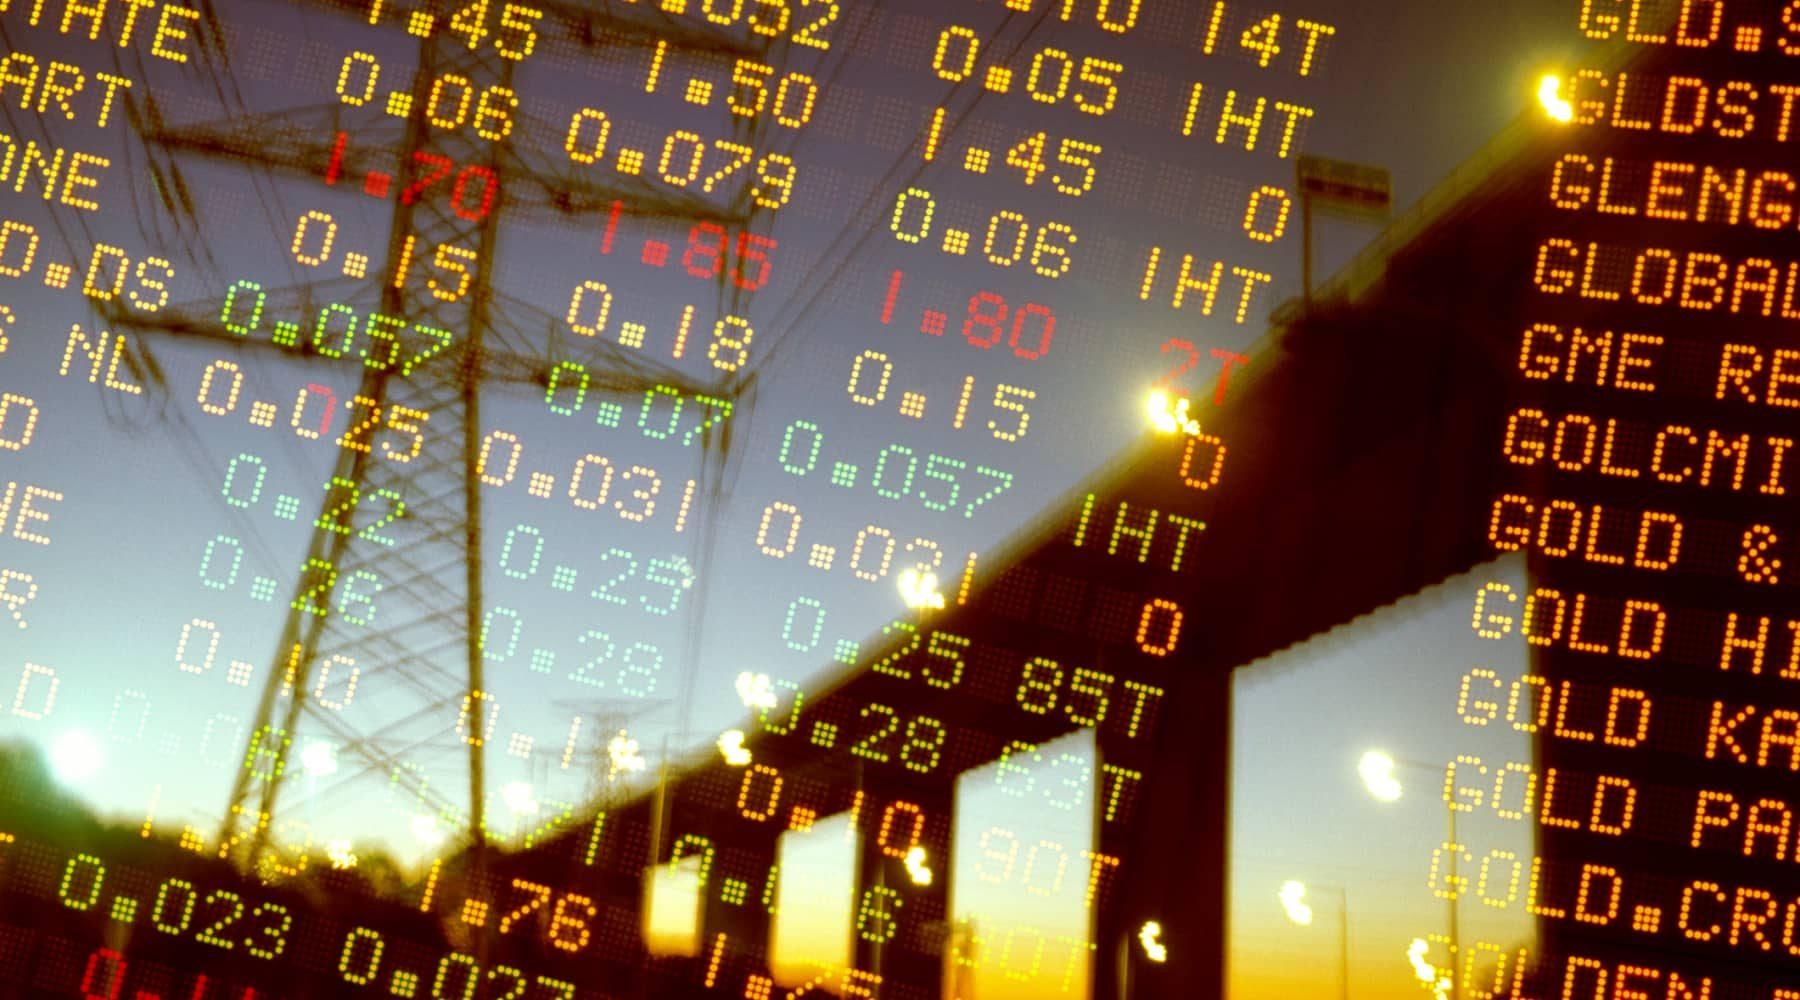 Today's top US stocks: Novavax Inc (NVAX ↑11.8%), Quantumscape Corp (QS ↑11.6%)